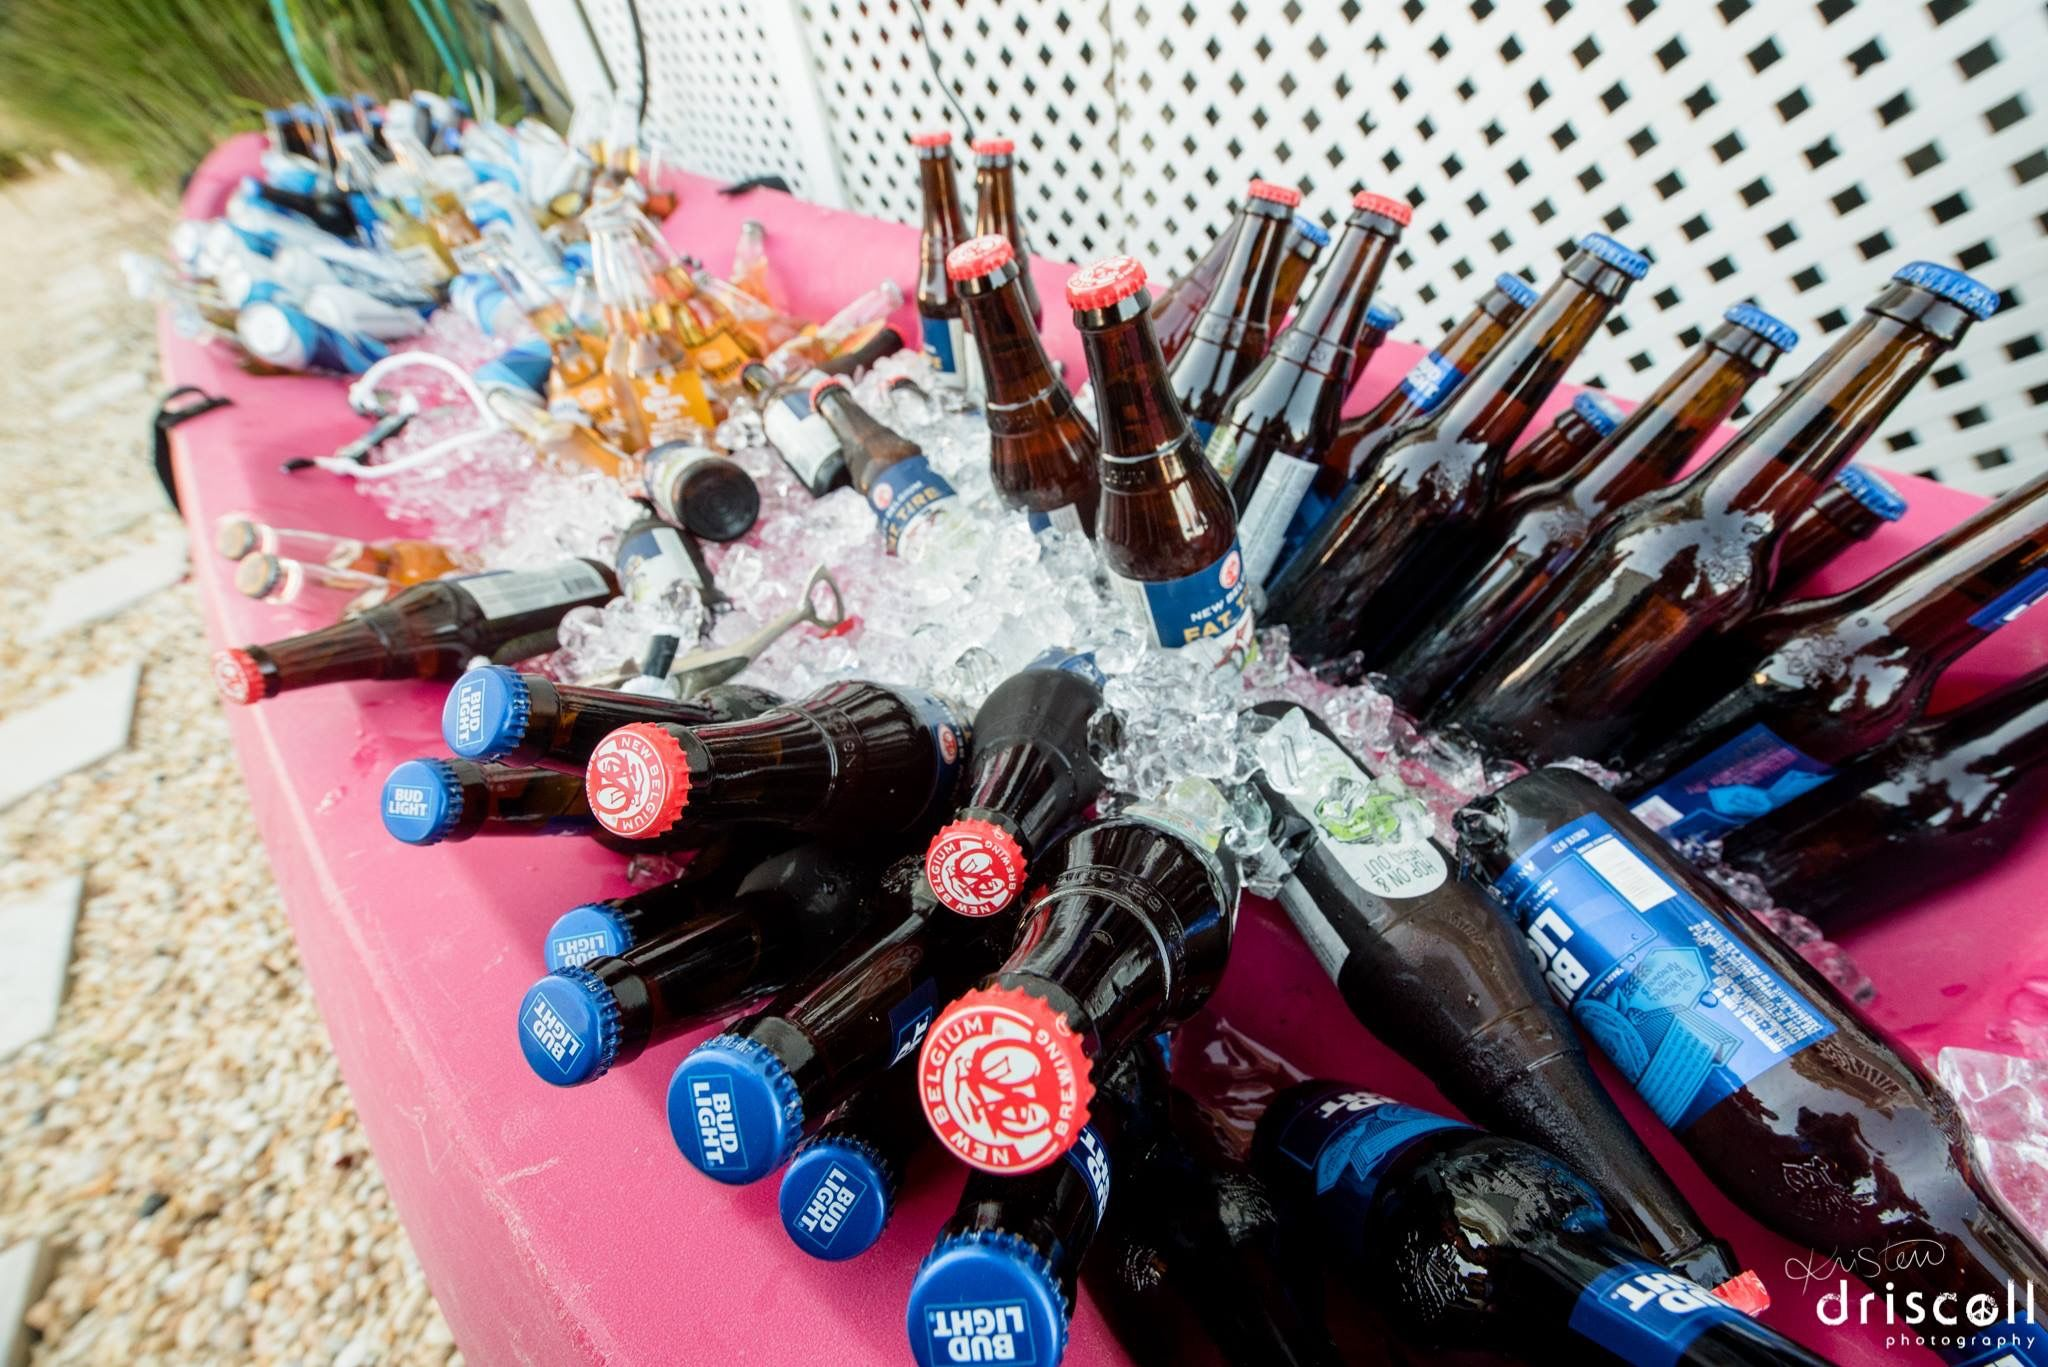 beer in a kayak for a nj backyard beach wedding nautical wedding